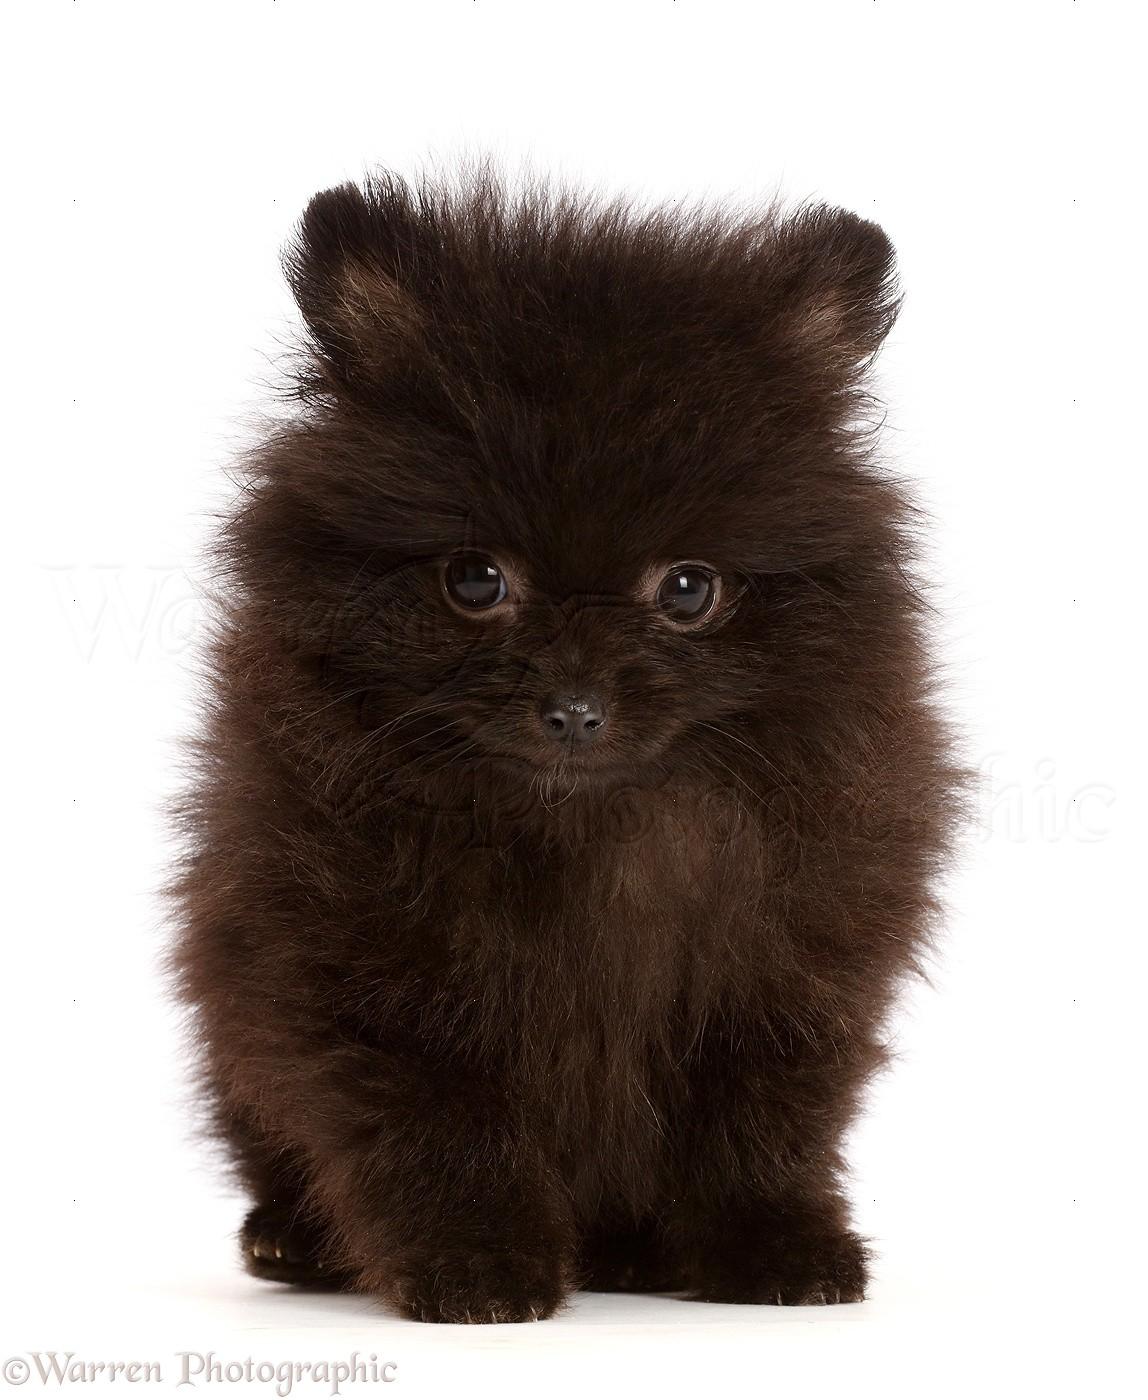 Dog Black Pomeranian Puppy Sitting Photo Wp47468